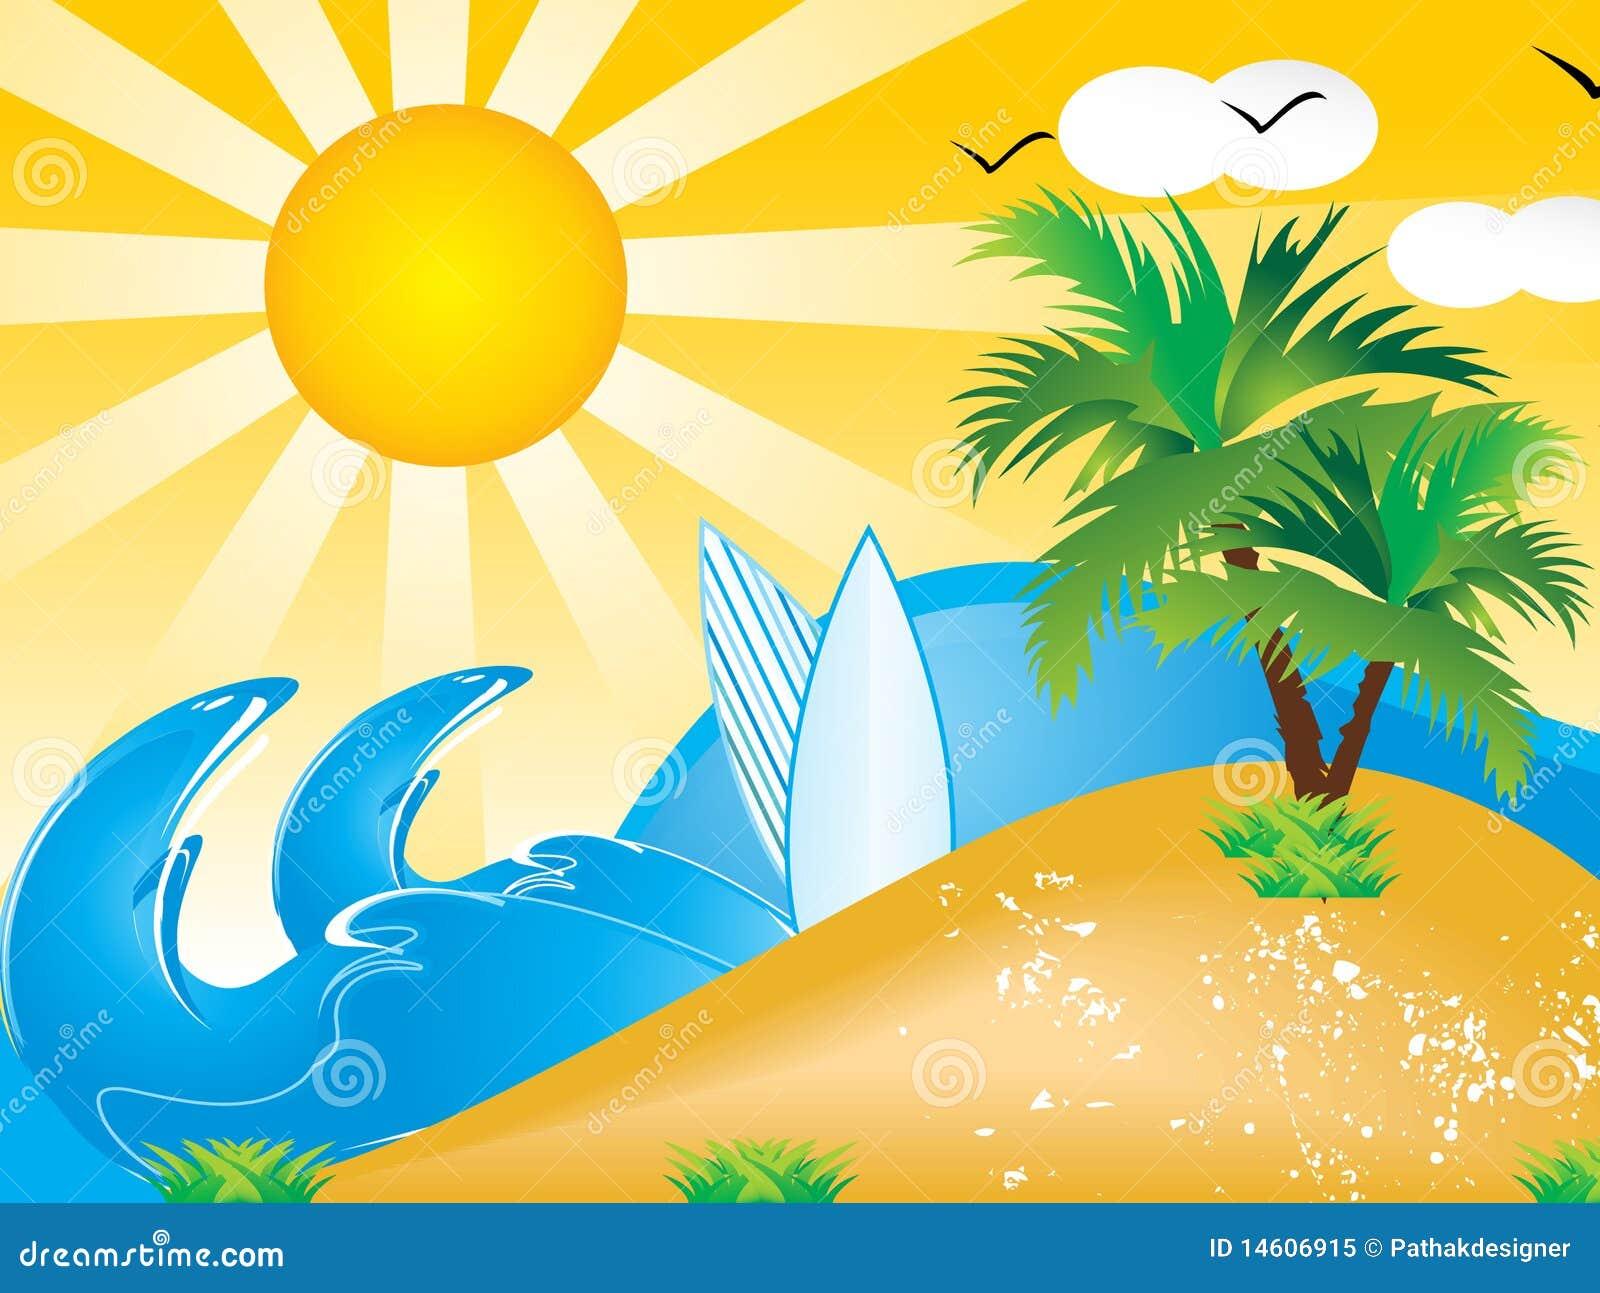 summer wallpaper swimming vector - photo #42